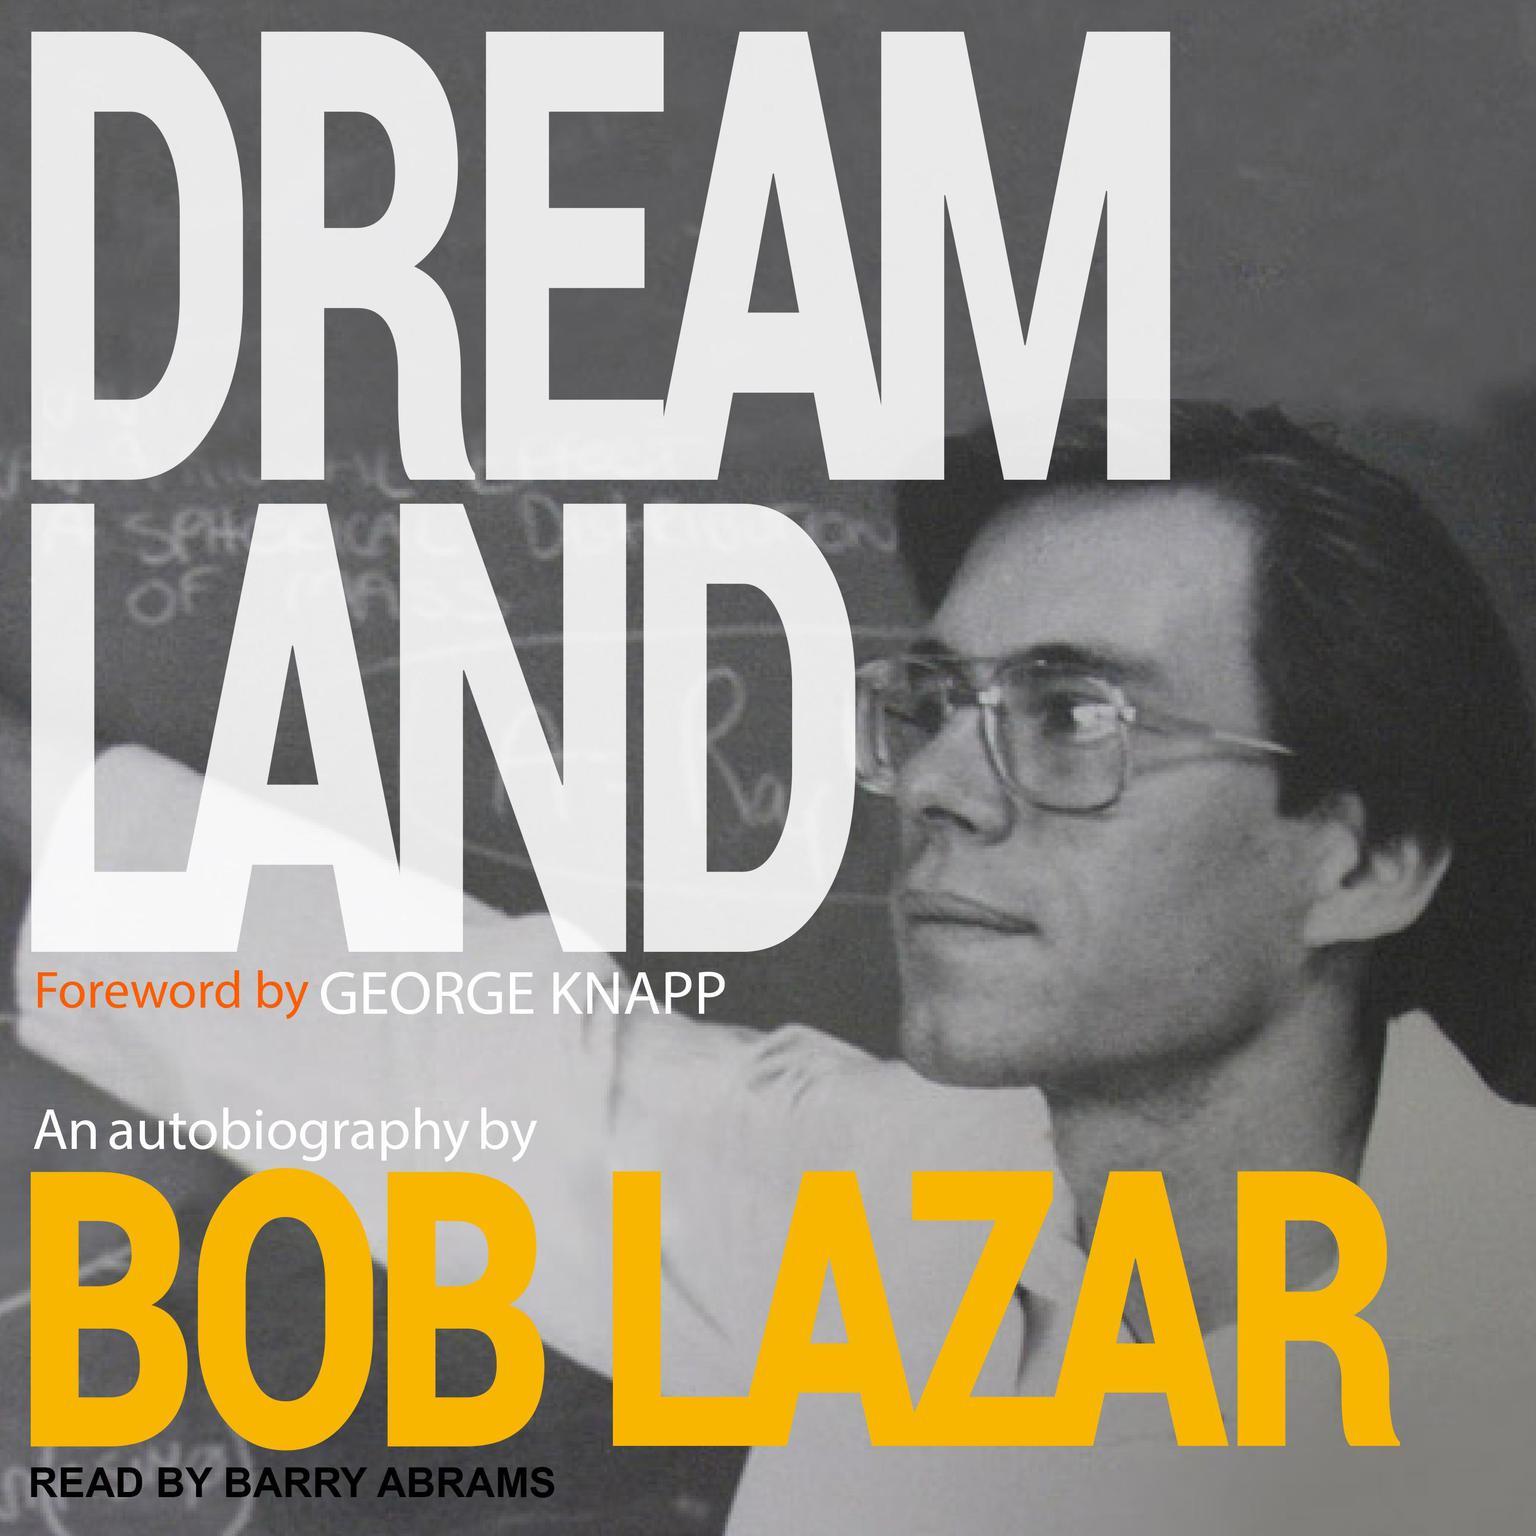 Printable Dreamland: An Autobiography Audiobook Cover Art